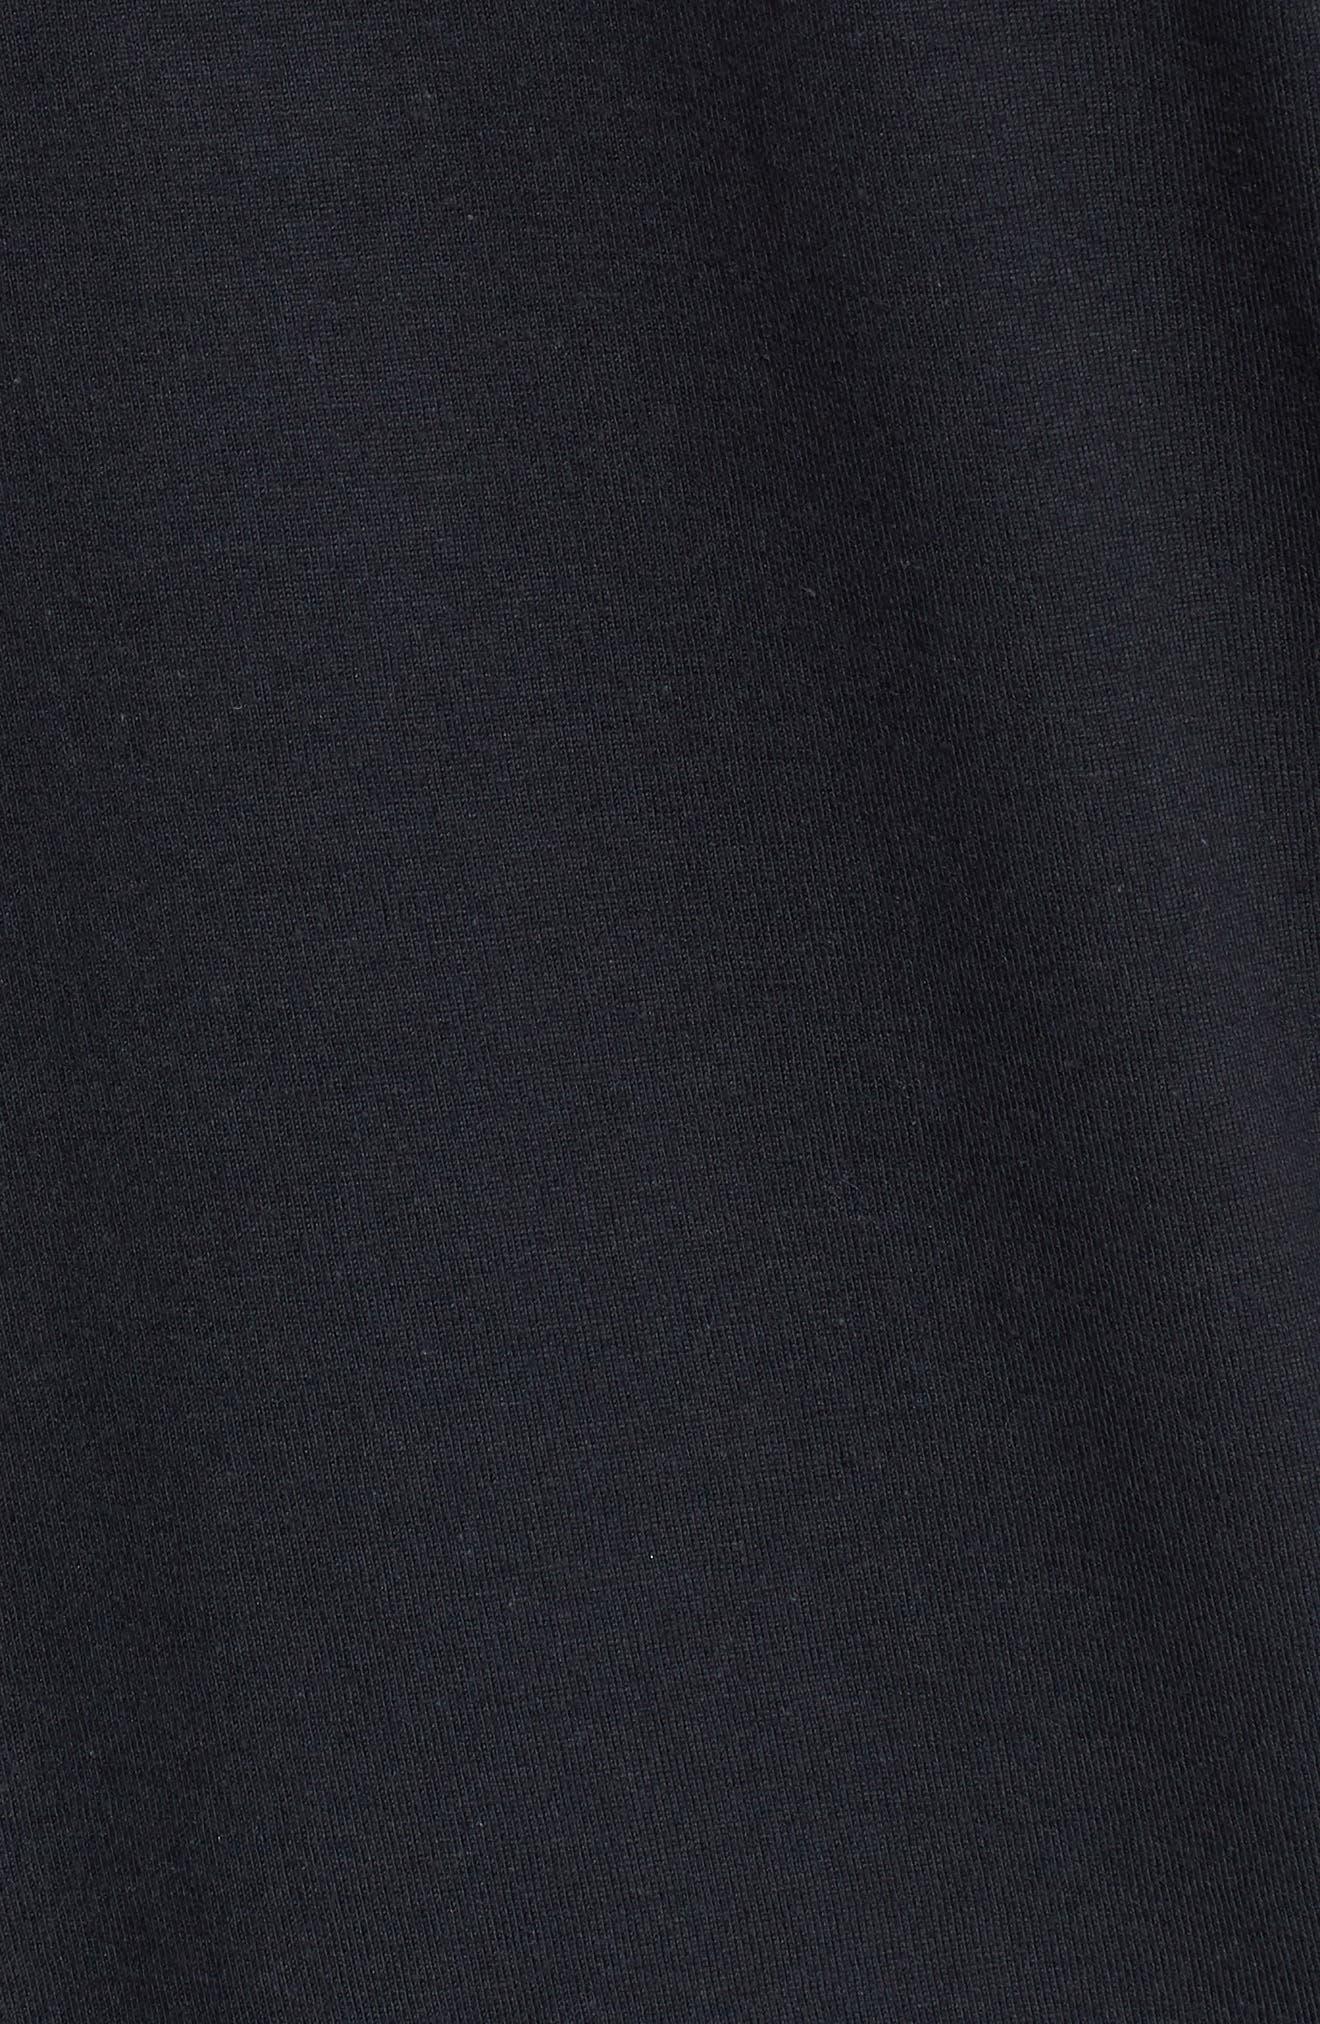 Sportswear 23 T-Shirt,                             Alternate thumbnail 5, color,                             BLACK/ INFRARED 23